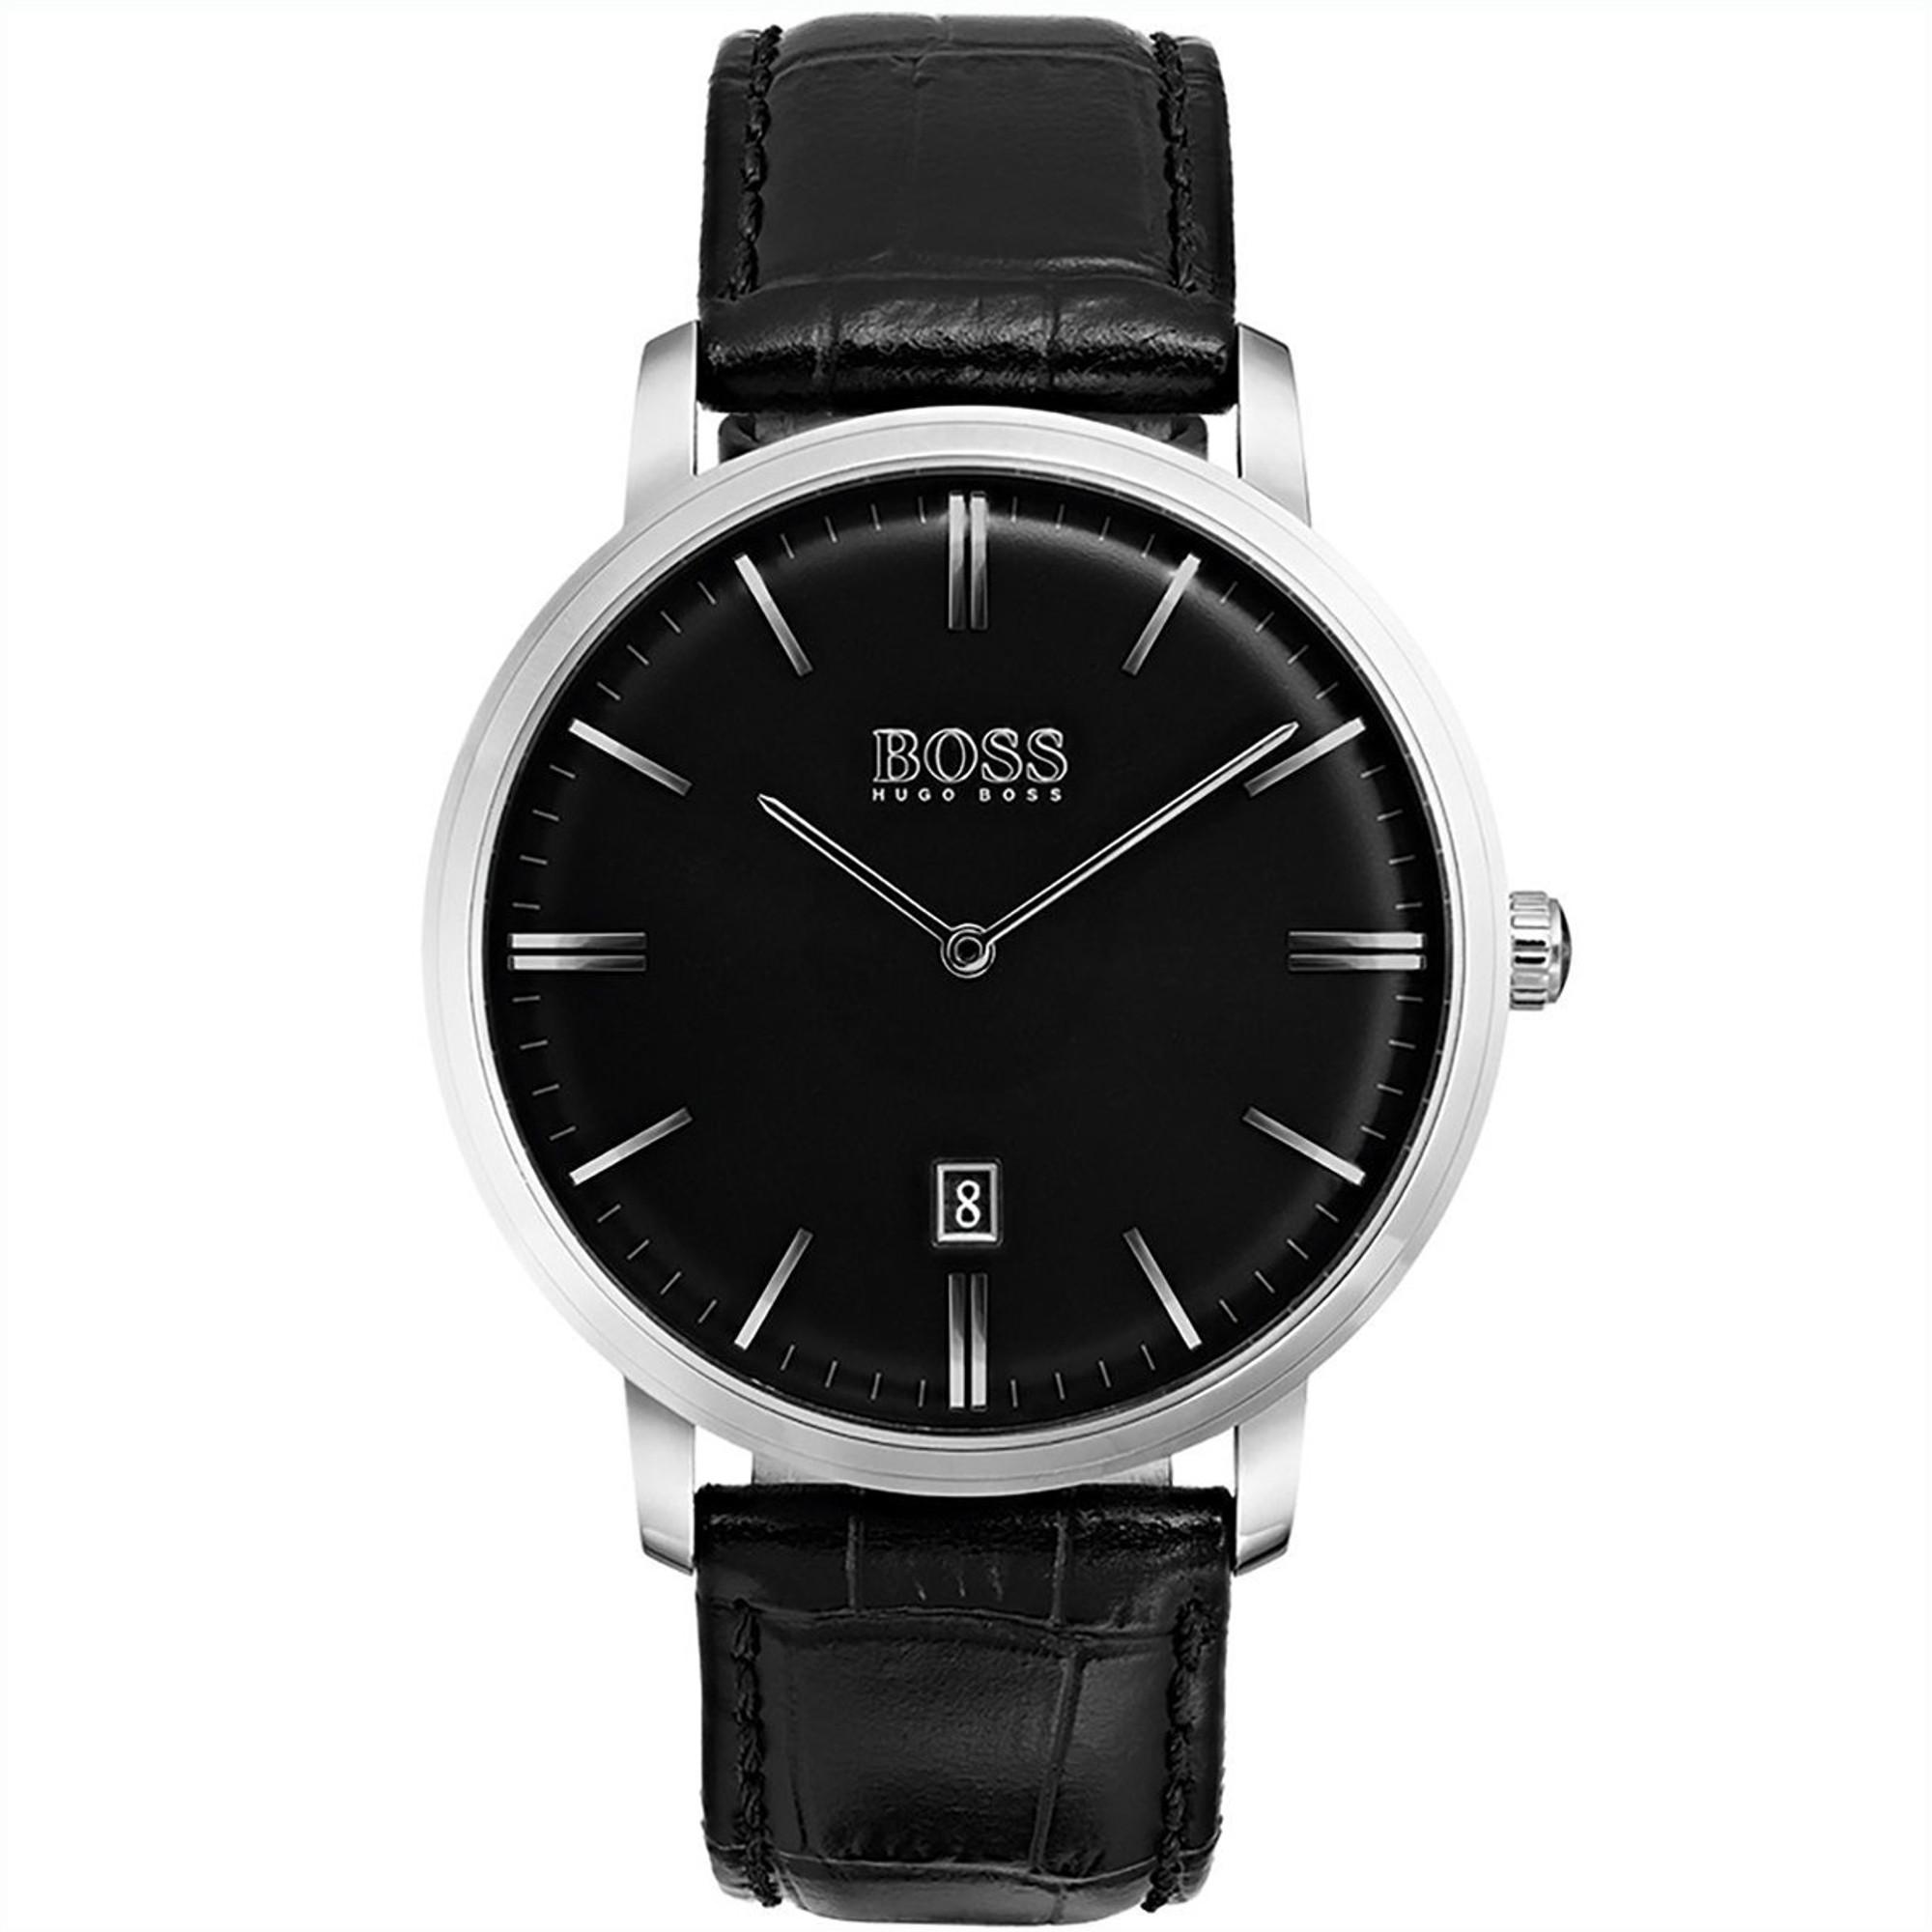 HUGO BOSS Tradition Classic Quarz Armbanduhr 1513460